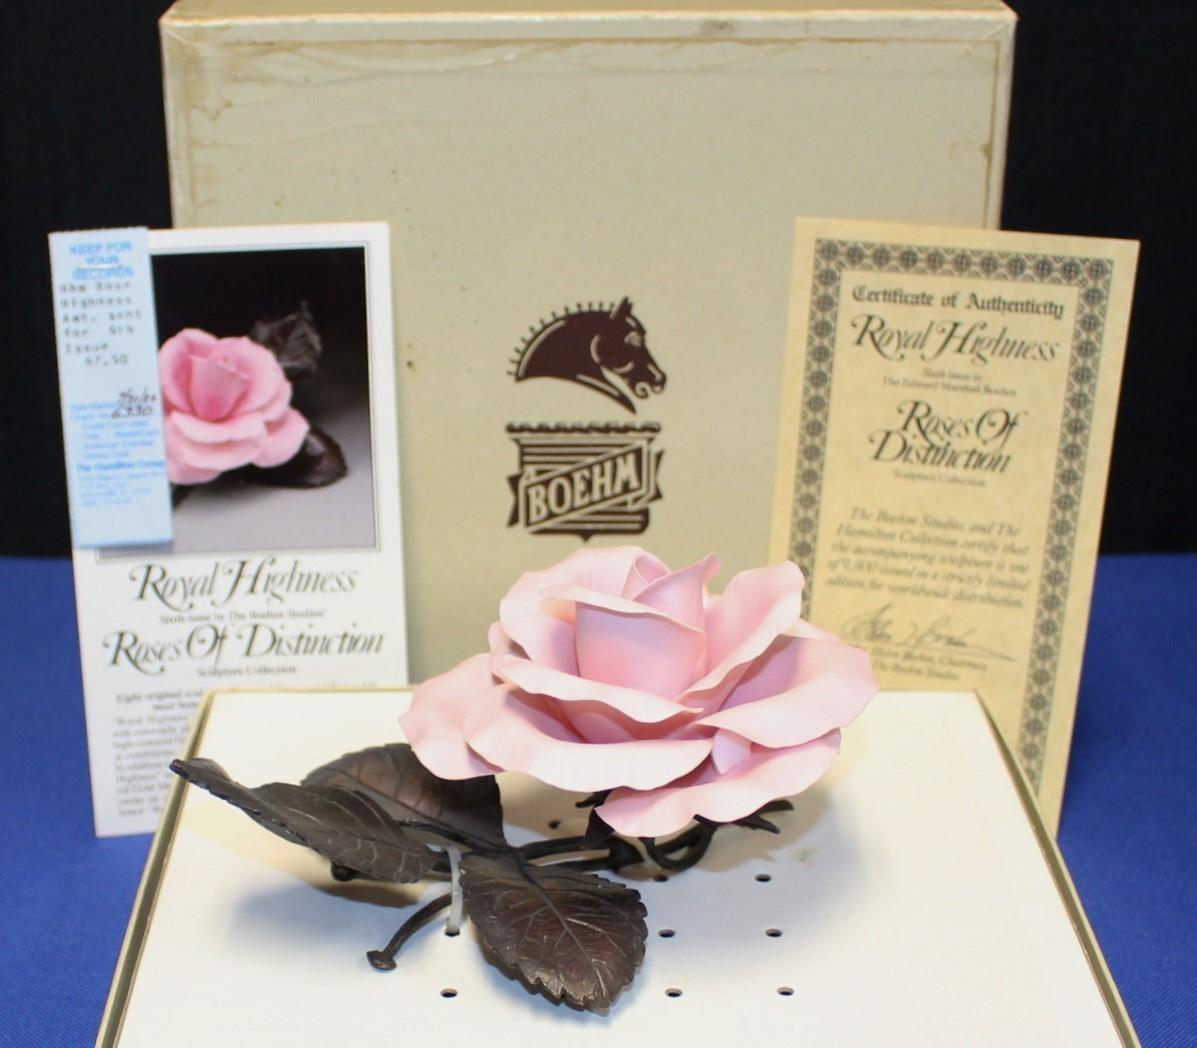 Boehm Porcelain & Bronze Royal Highness Pink Rose Sculpture Figurine, Box & COA